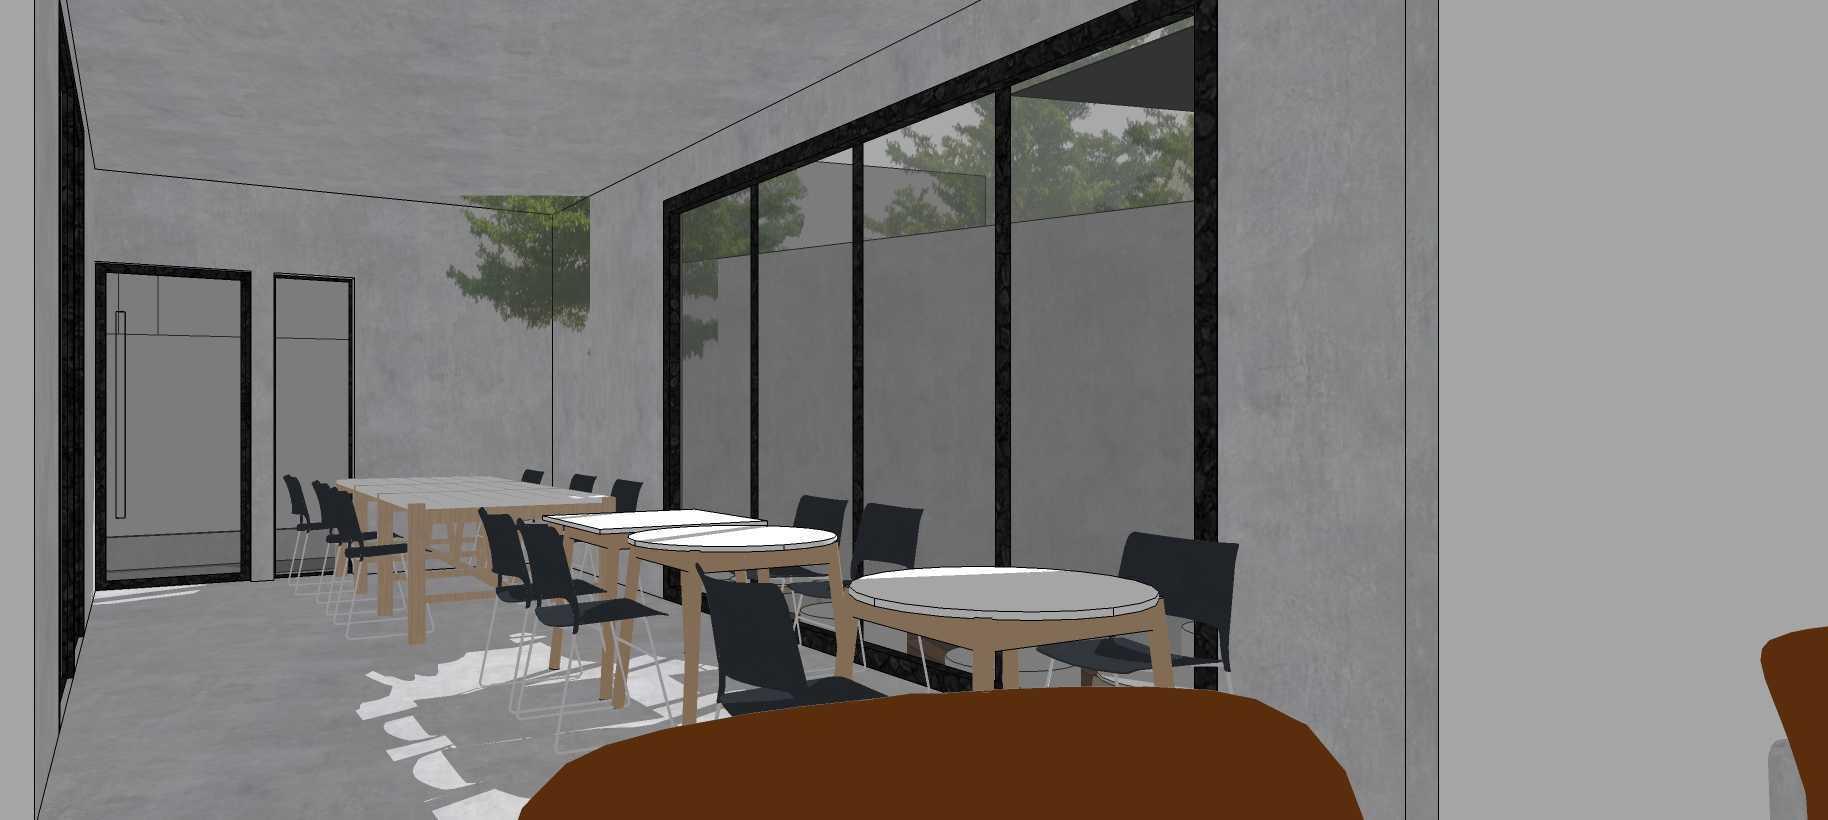 Rca  Architect Cafe At Pleburan Semarang Semarang, Kota Semarang, Jawa Tengah, Indonesia Semarang, Kota Semarang, Jawa Tengah, Indonesia Rangga-Cahya-Cafe-At-Pleburan-Semarang  116495